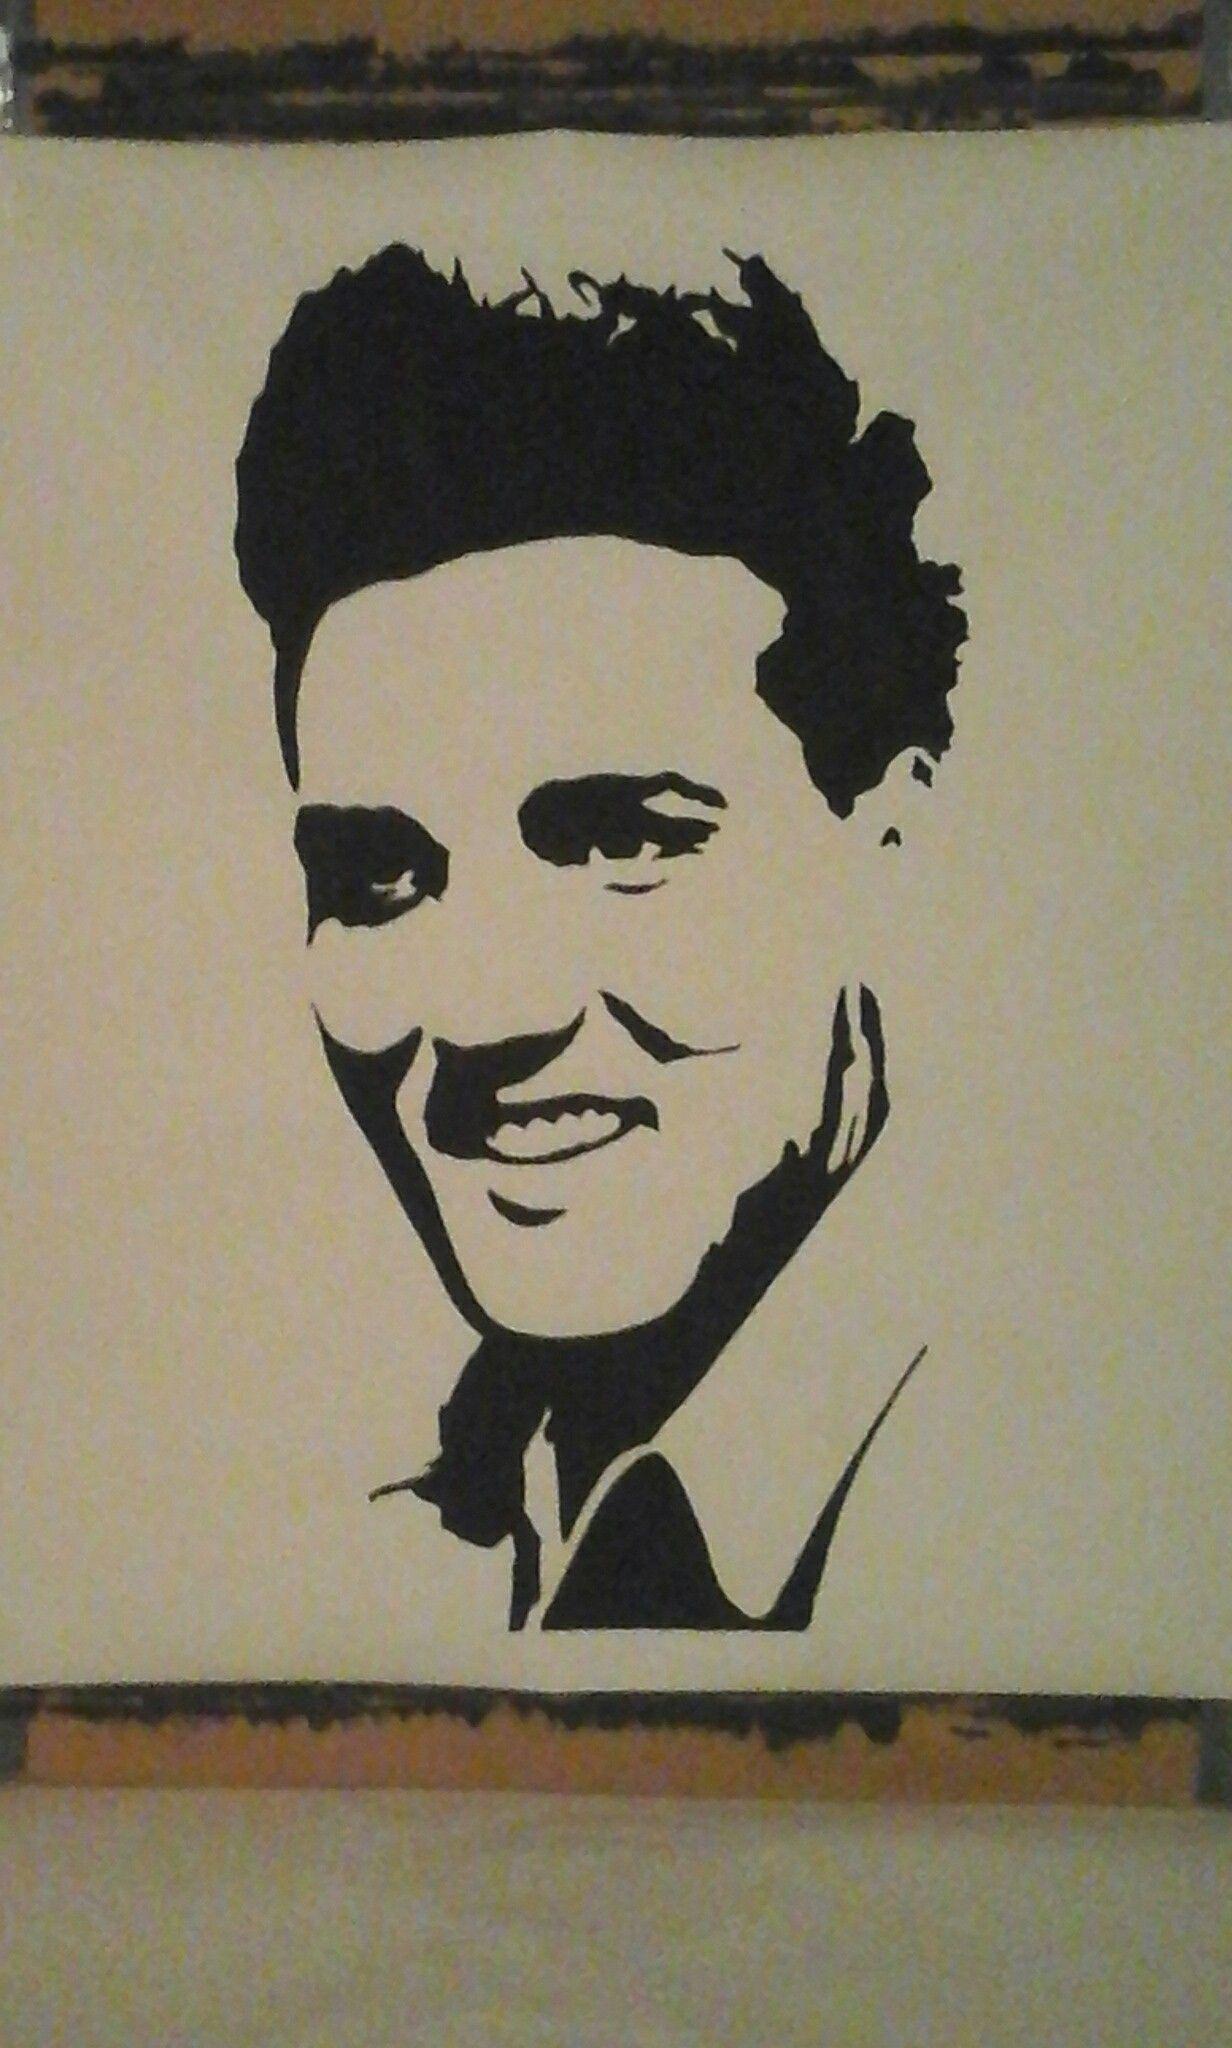 Elvis Presley / painting by Roy imagens) Ideias